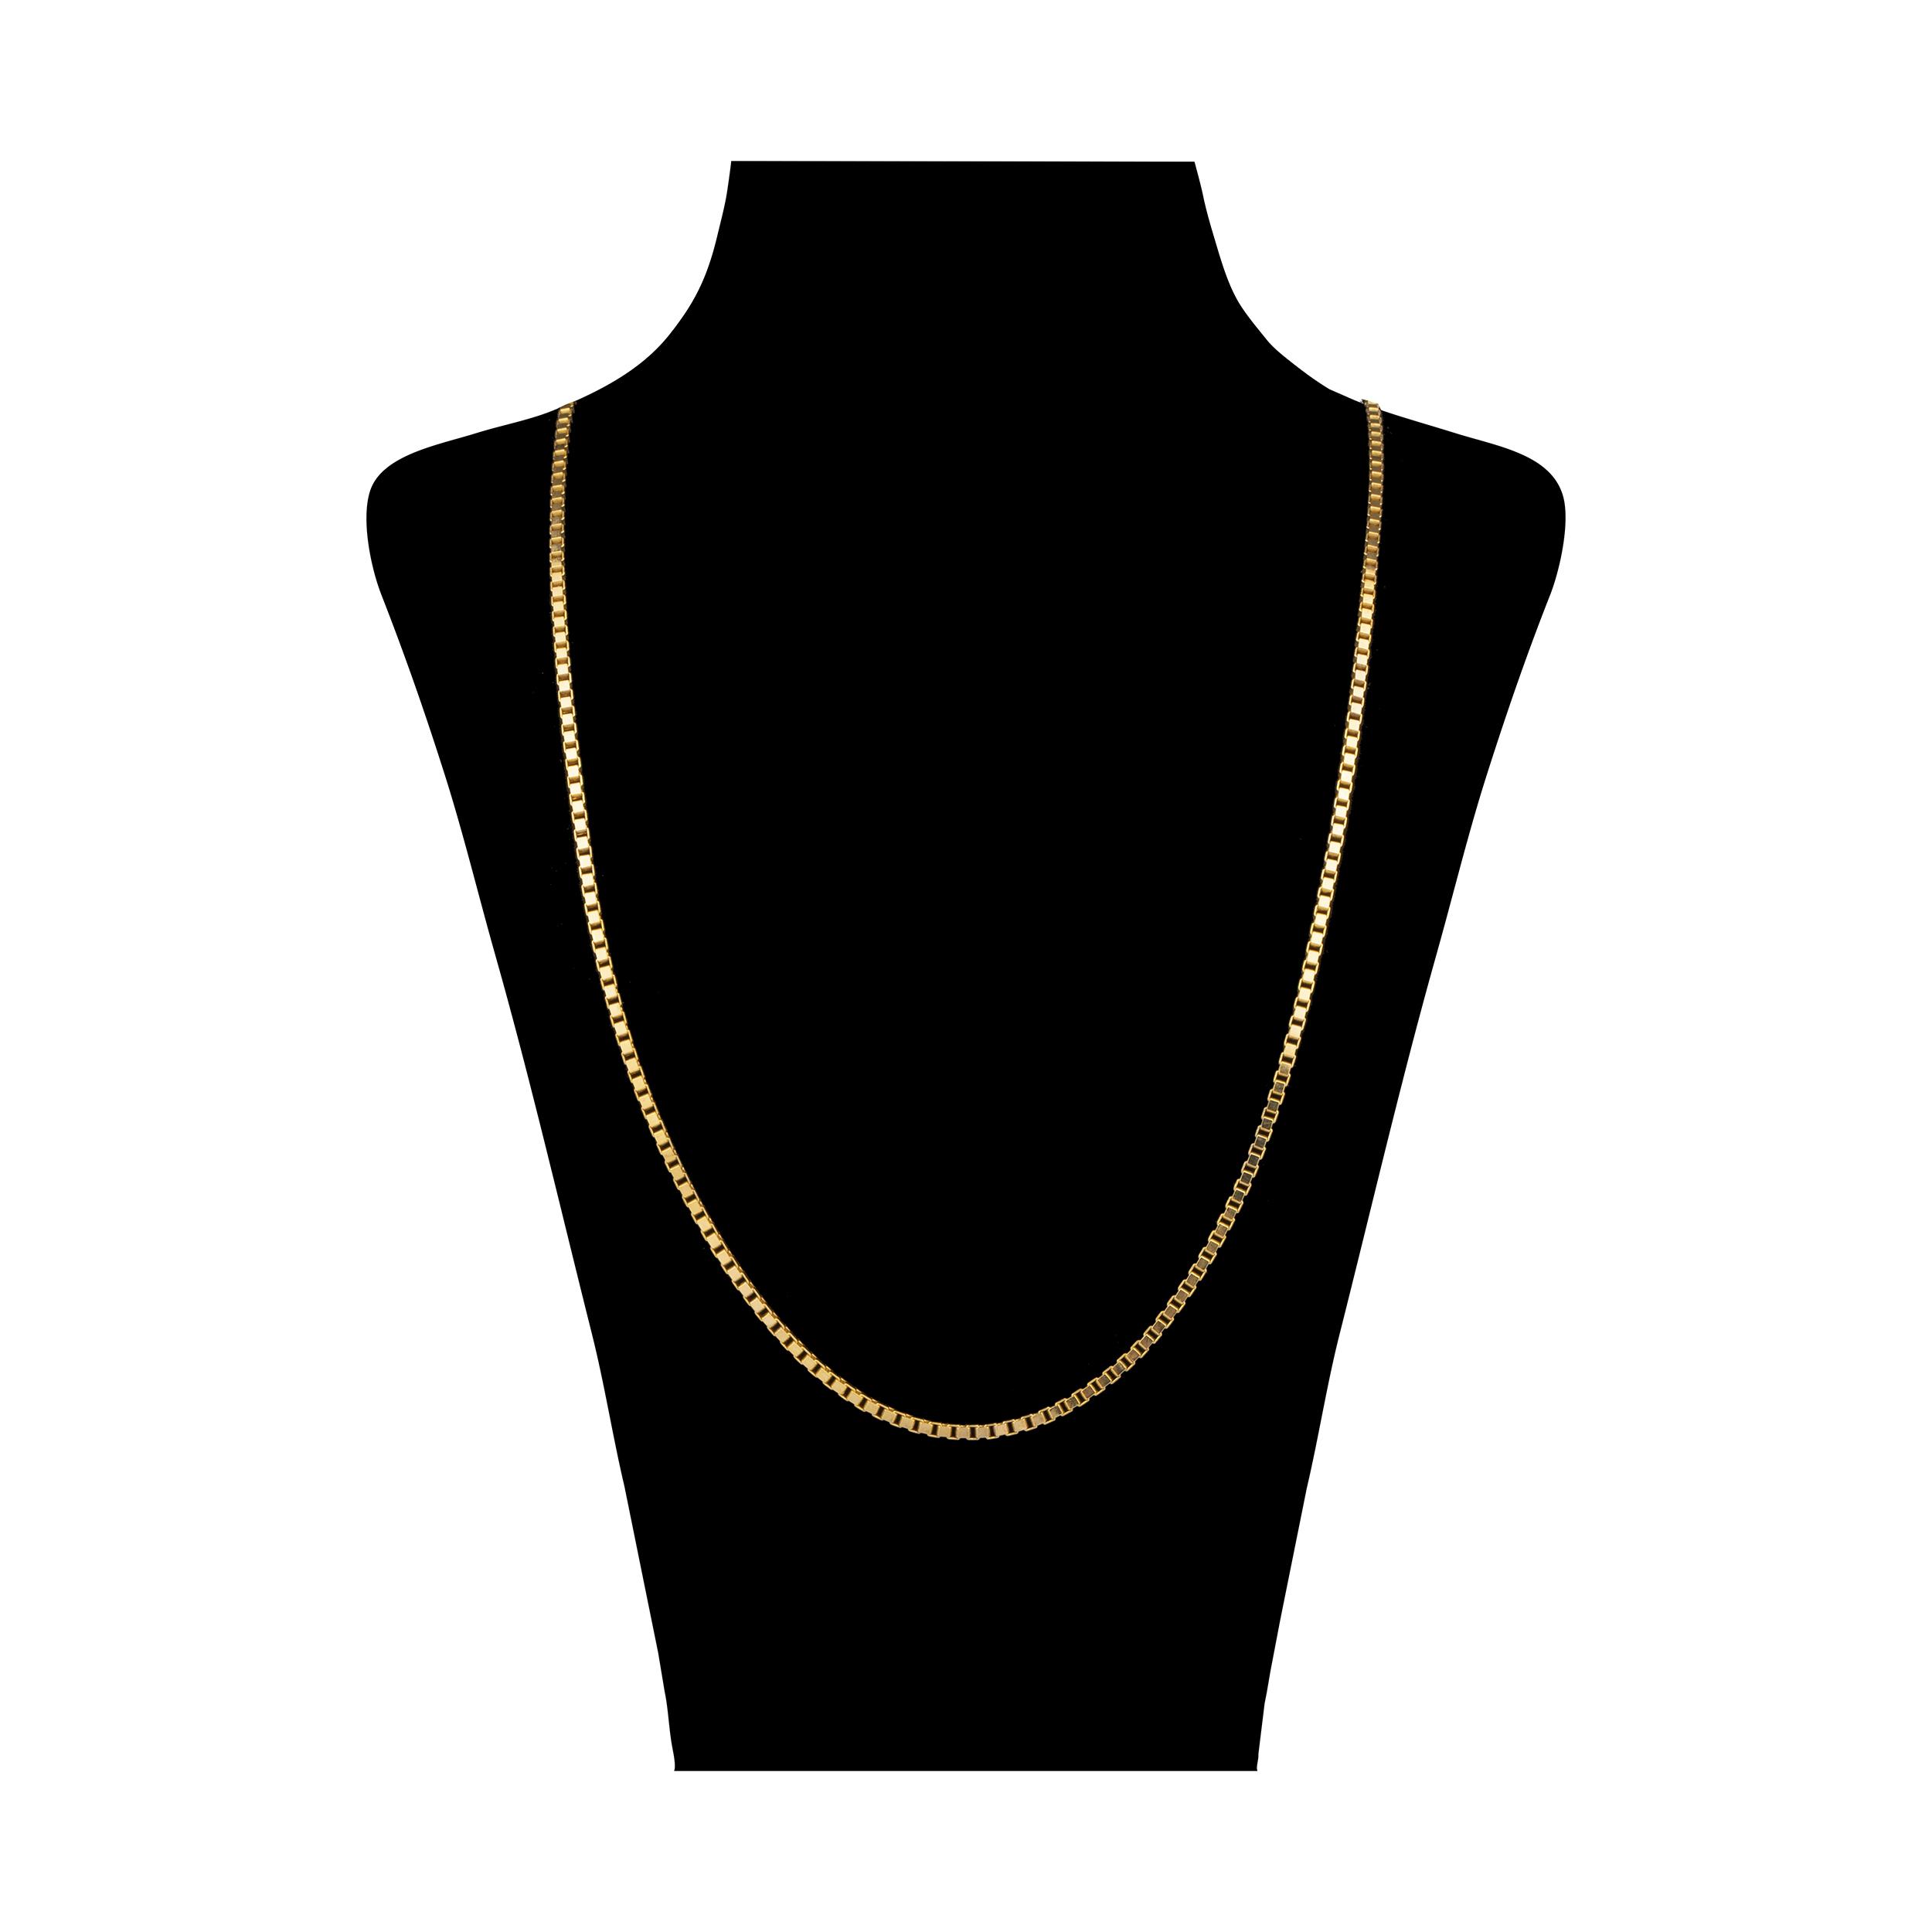 زنجیر طلا 18 عیار زنانه آلند کد TZ32